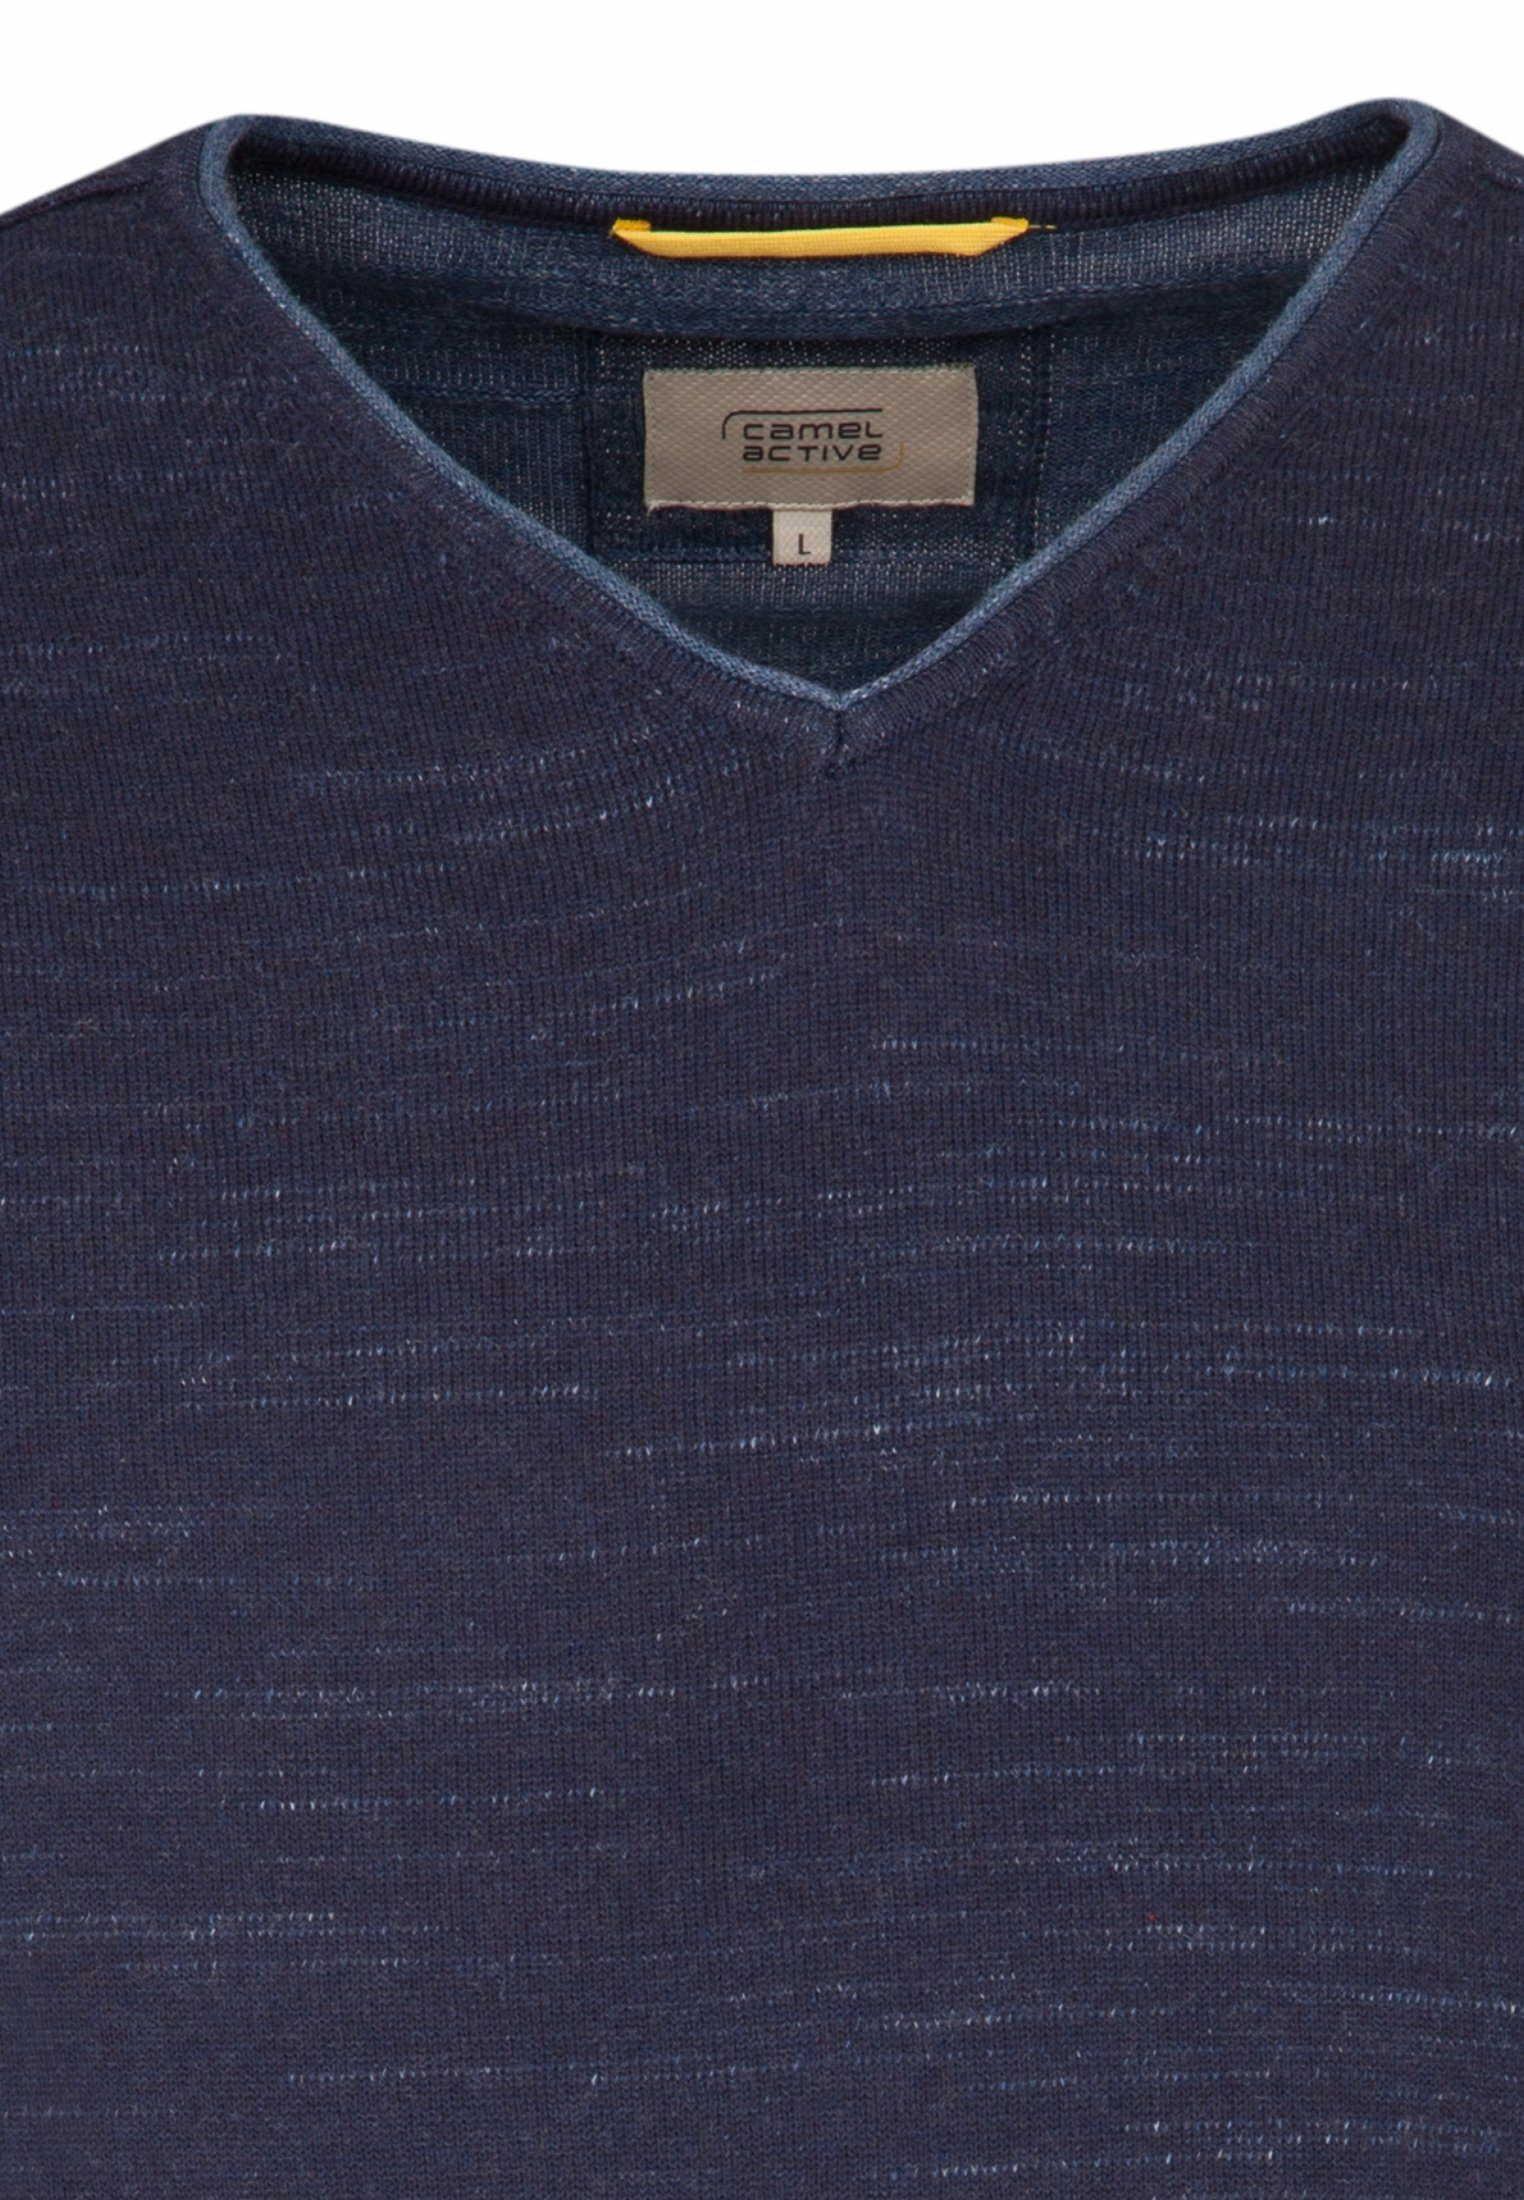 Camel Active V Pullover in blau günstig kaufen